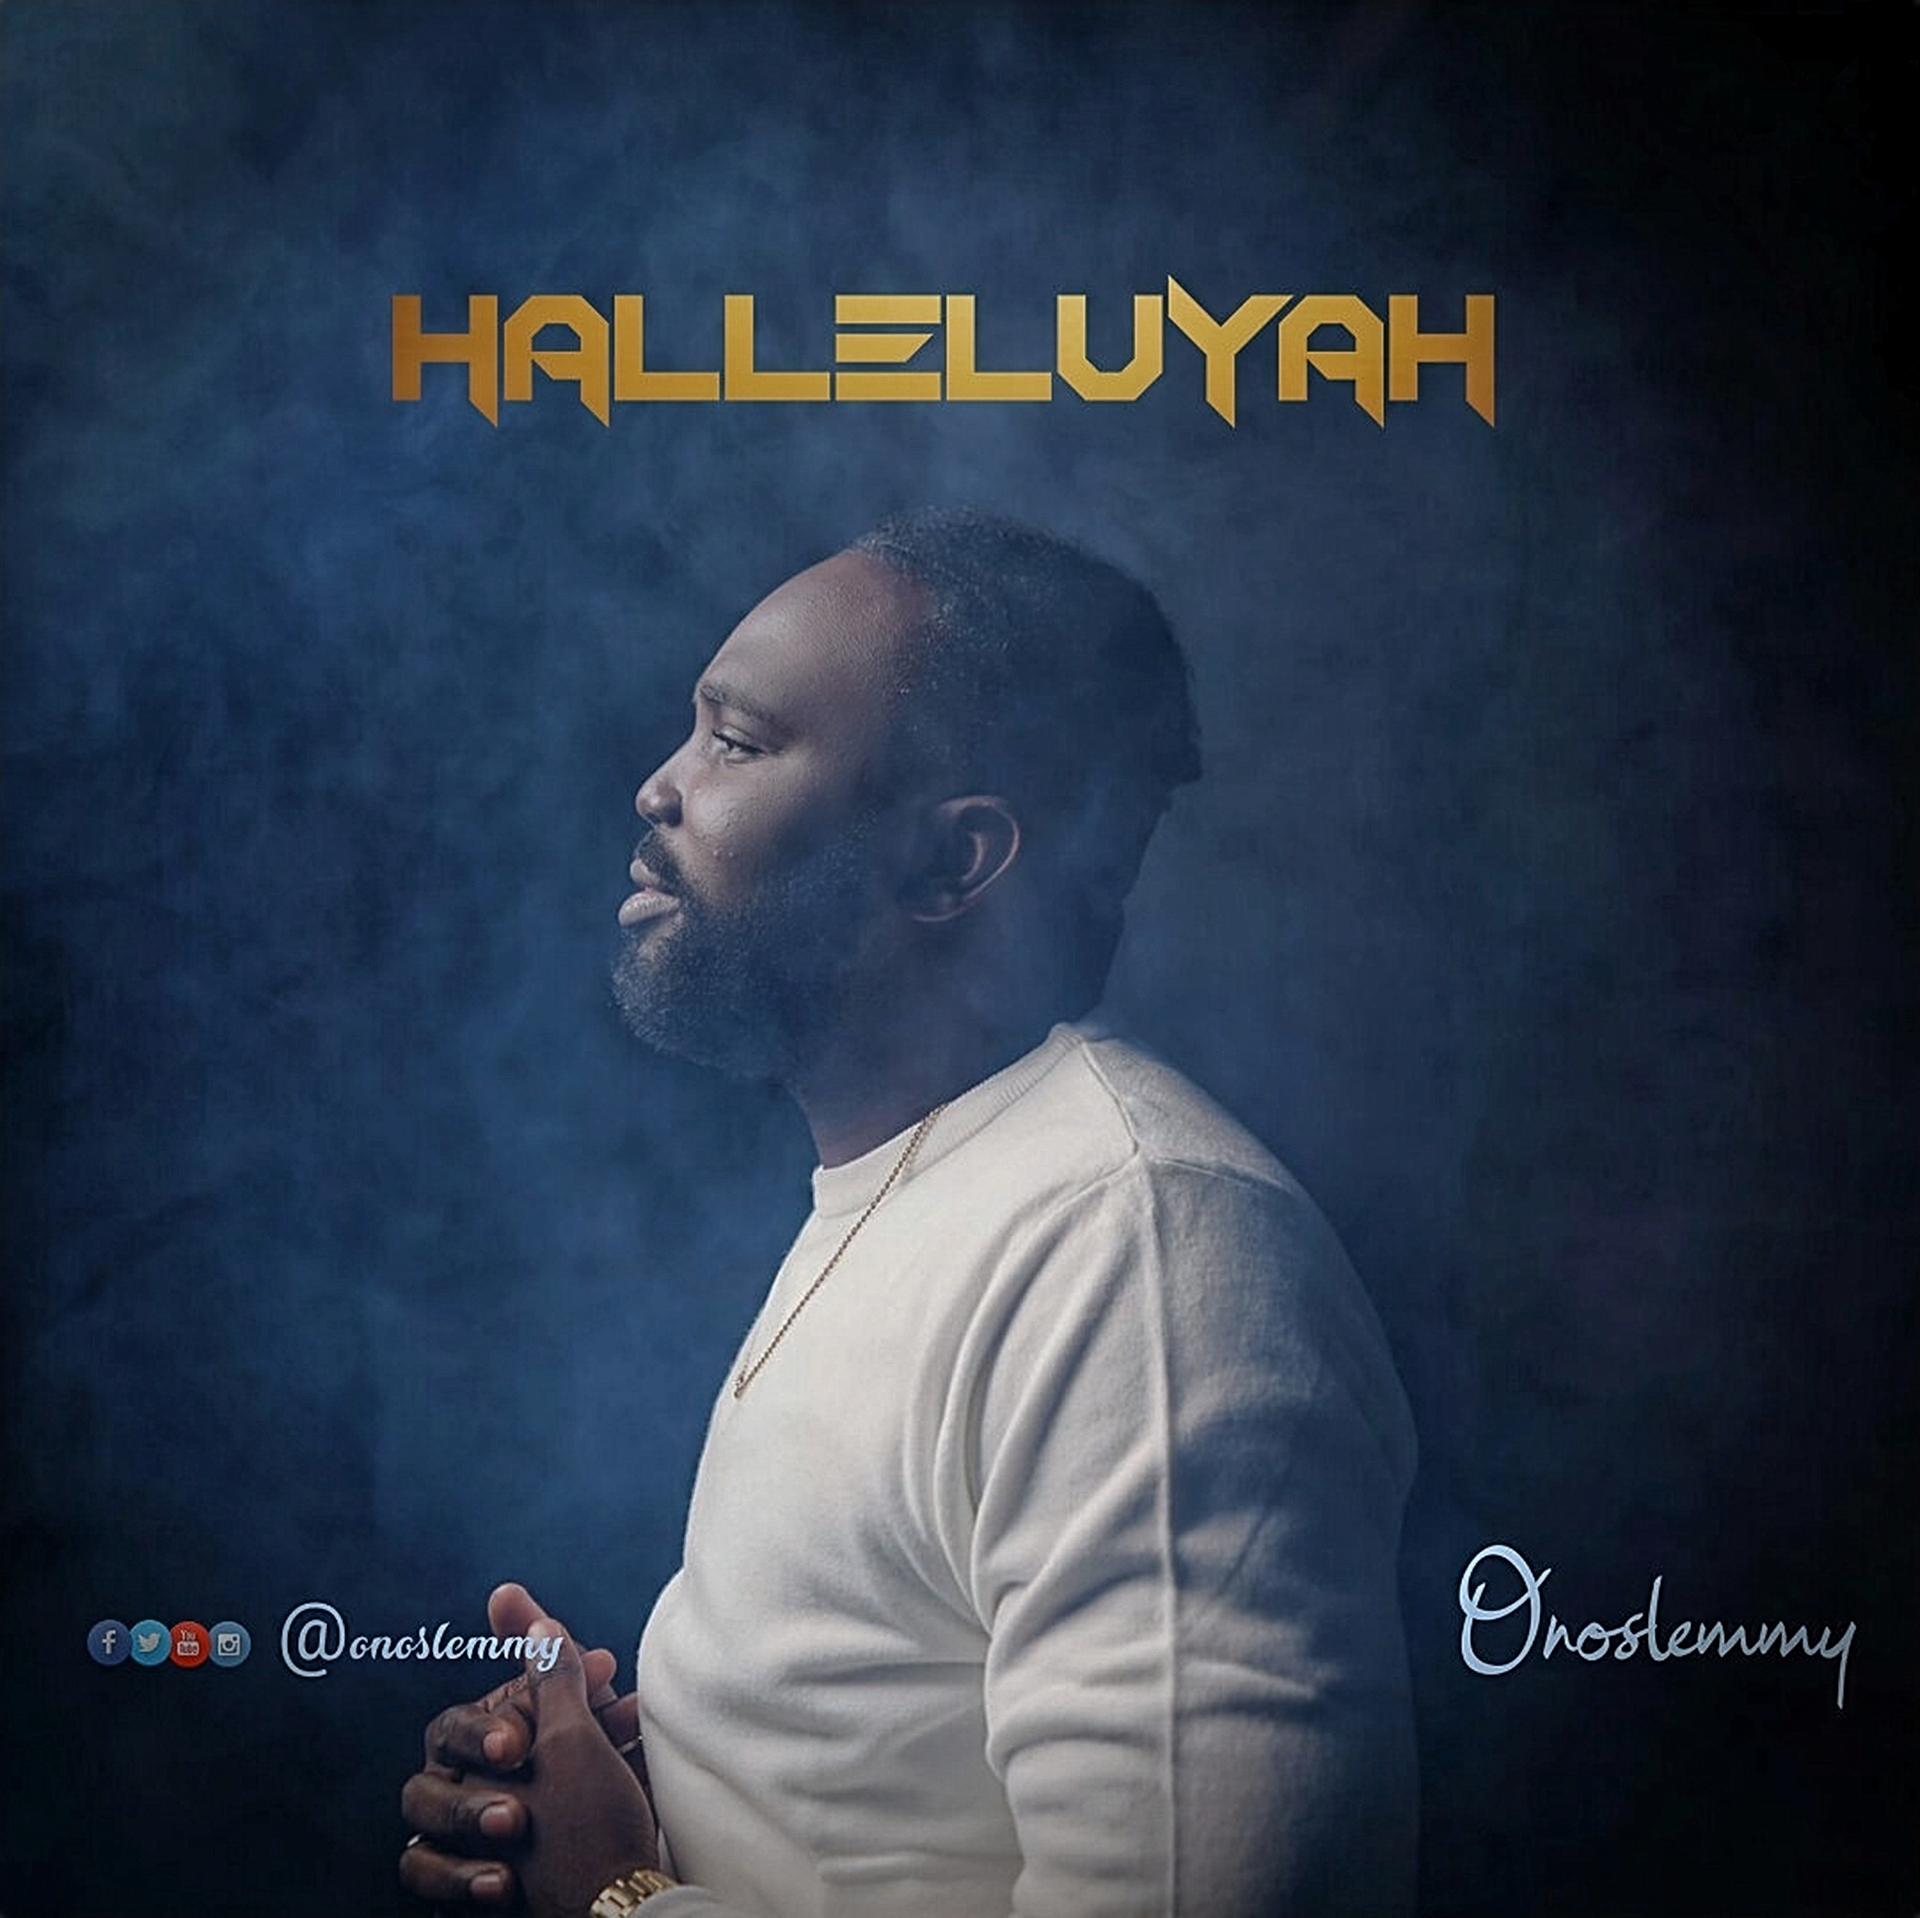 Download Mp3: Onoslemmy - Hallelujah